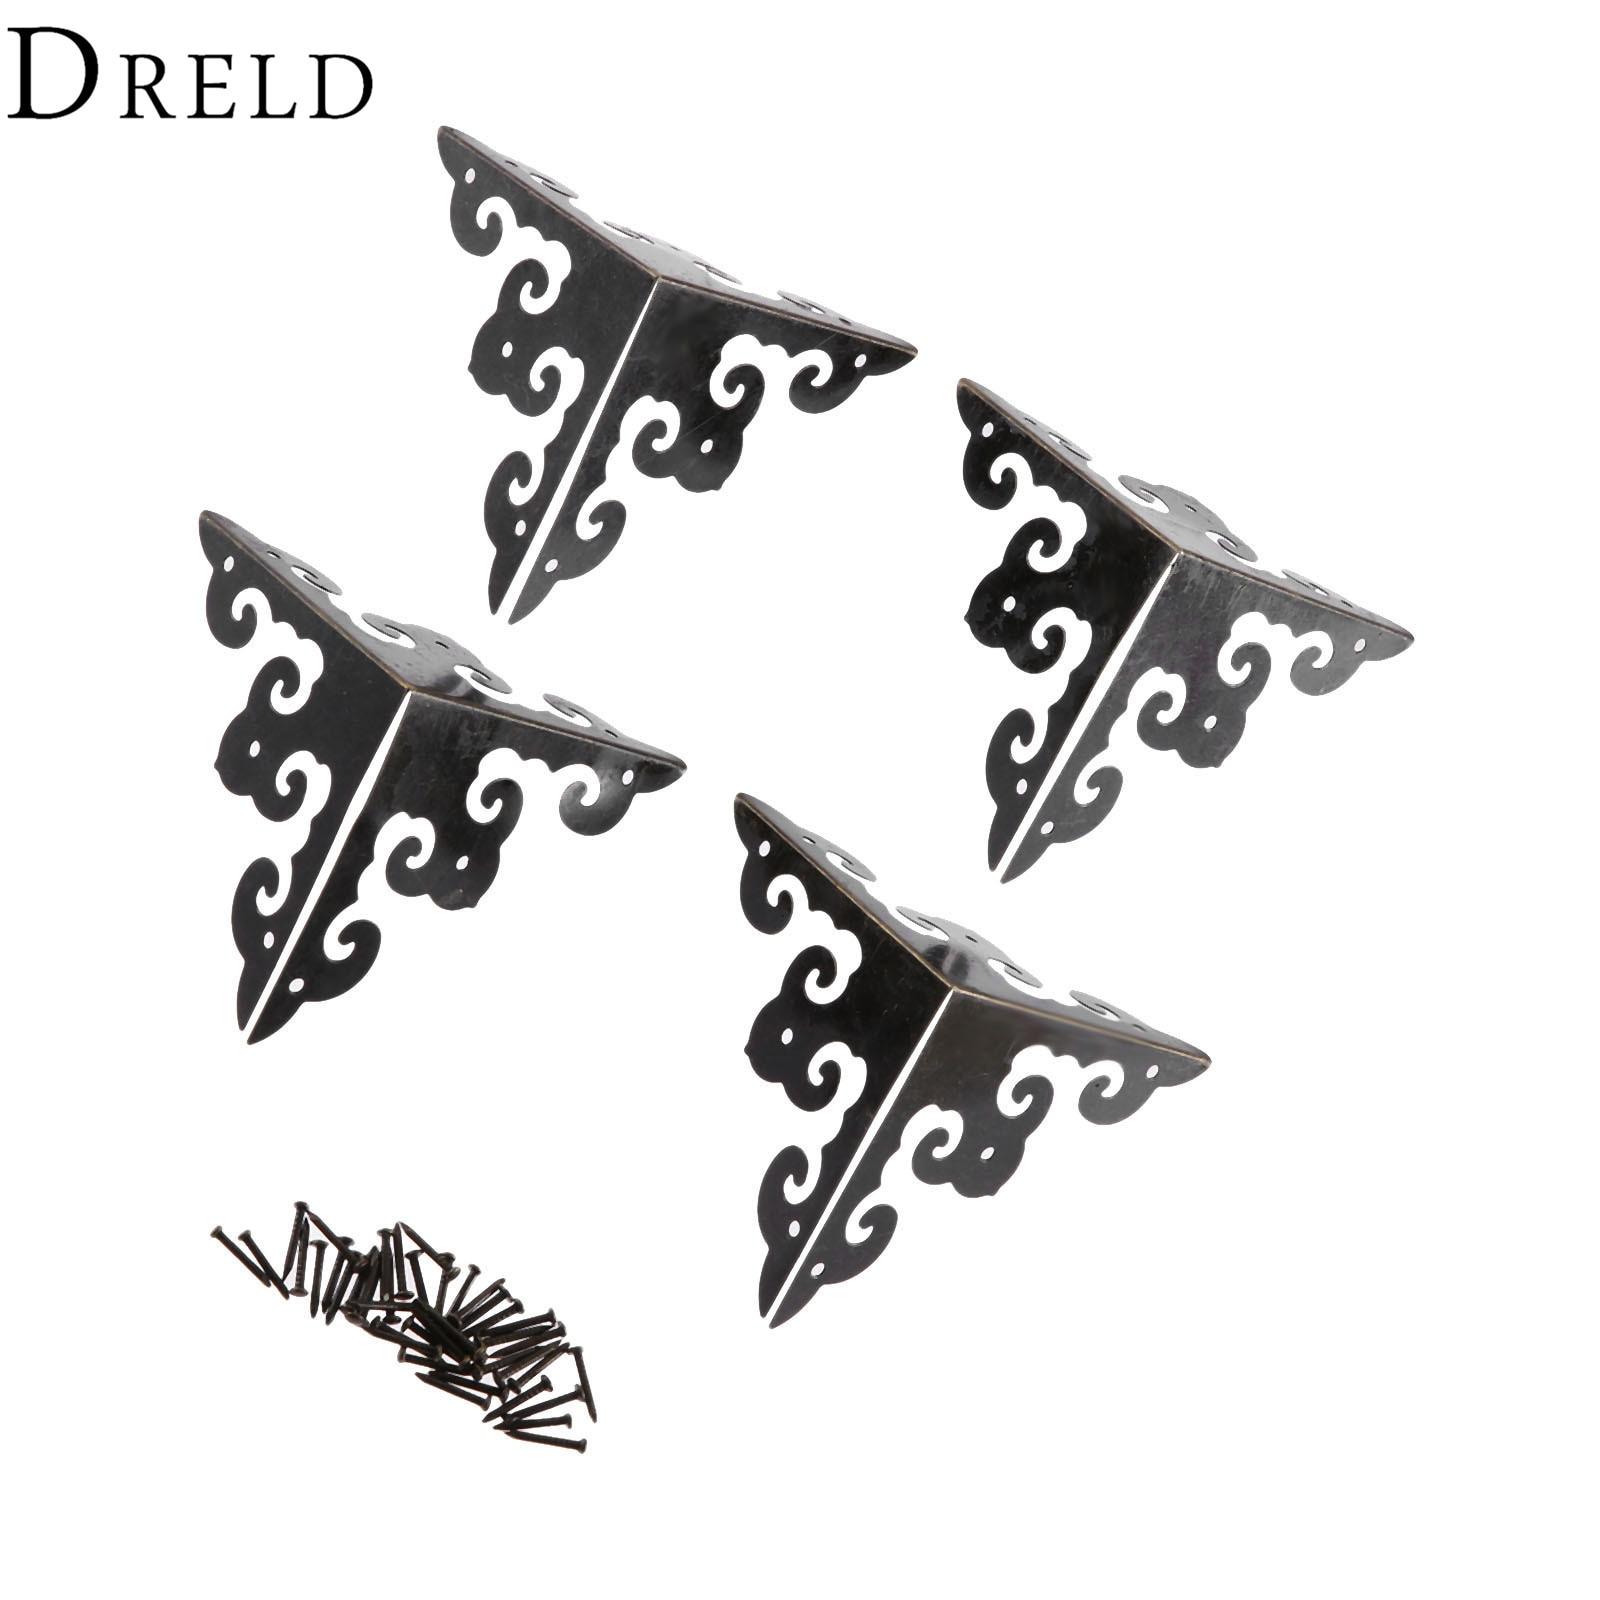 dreld-4pcs-50mm-antique-bronze-wood-box-feet-leg-corner-protector-guard-metal-crafts-decorative-bracket-for-furniture-hardware